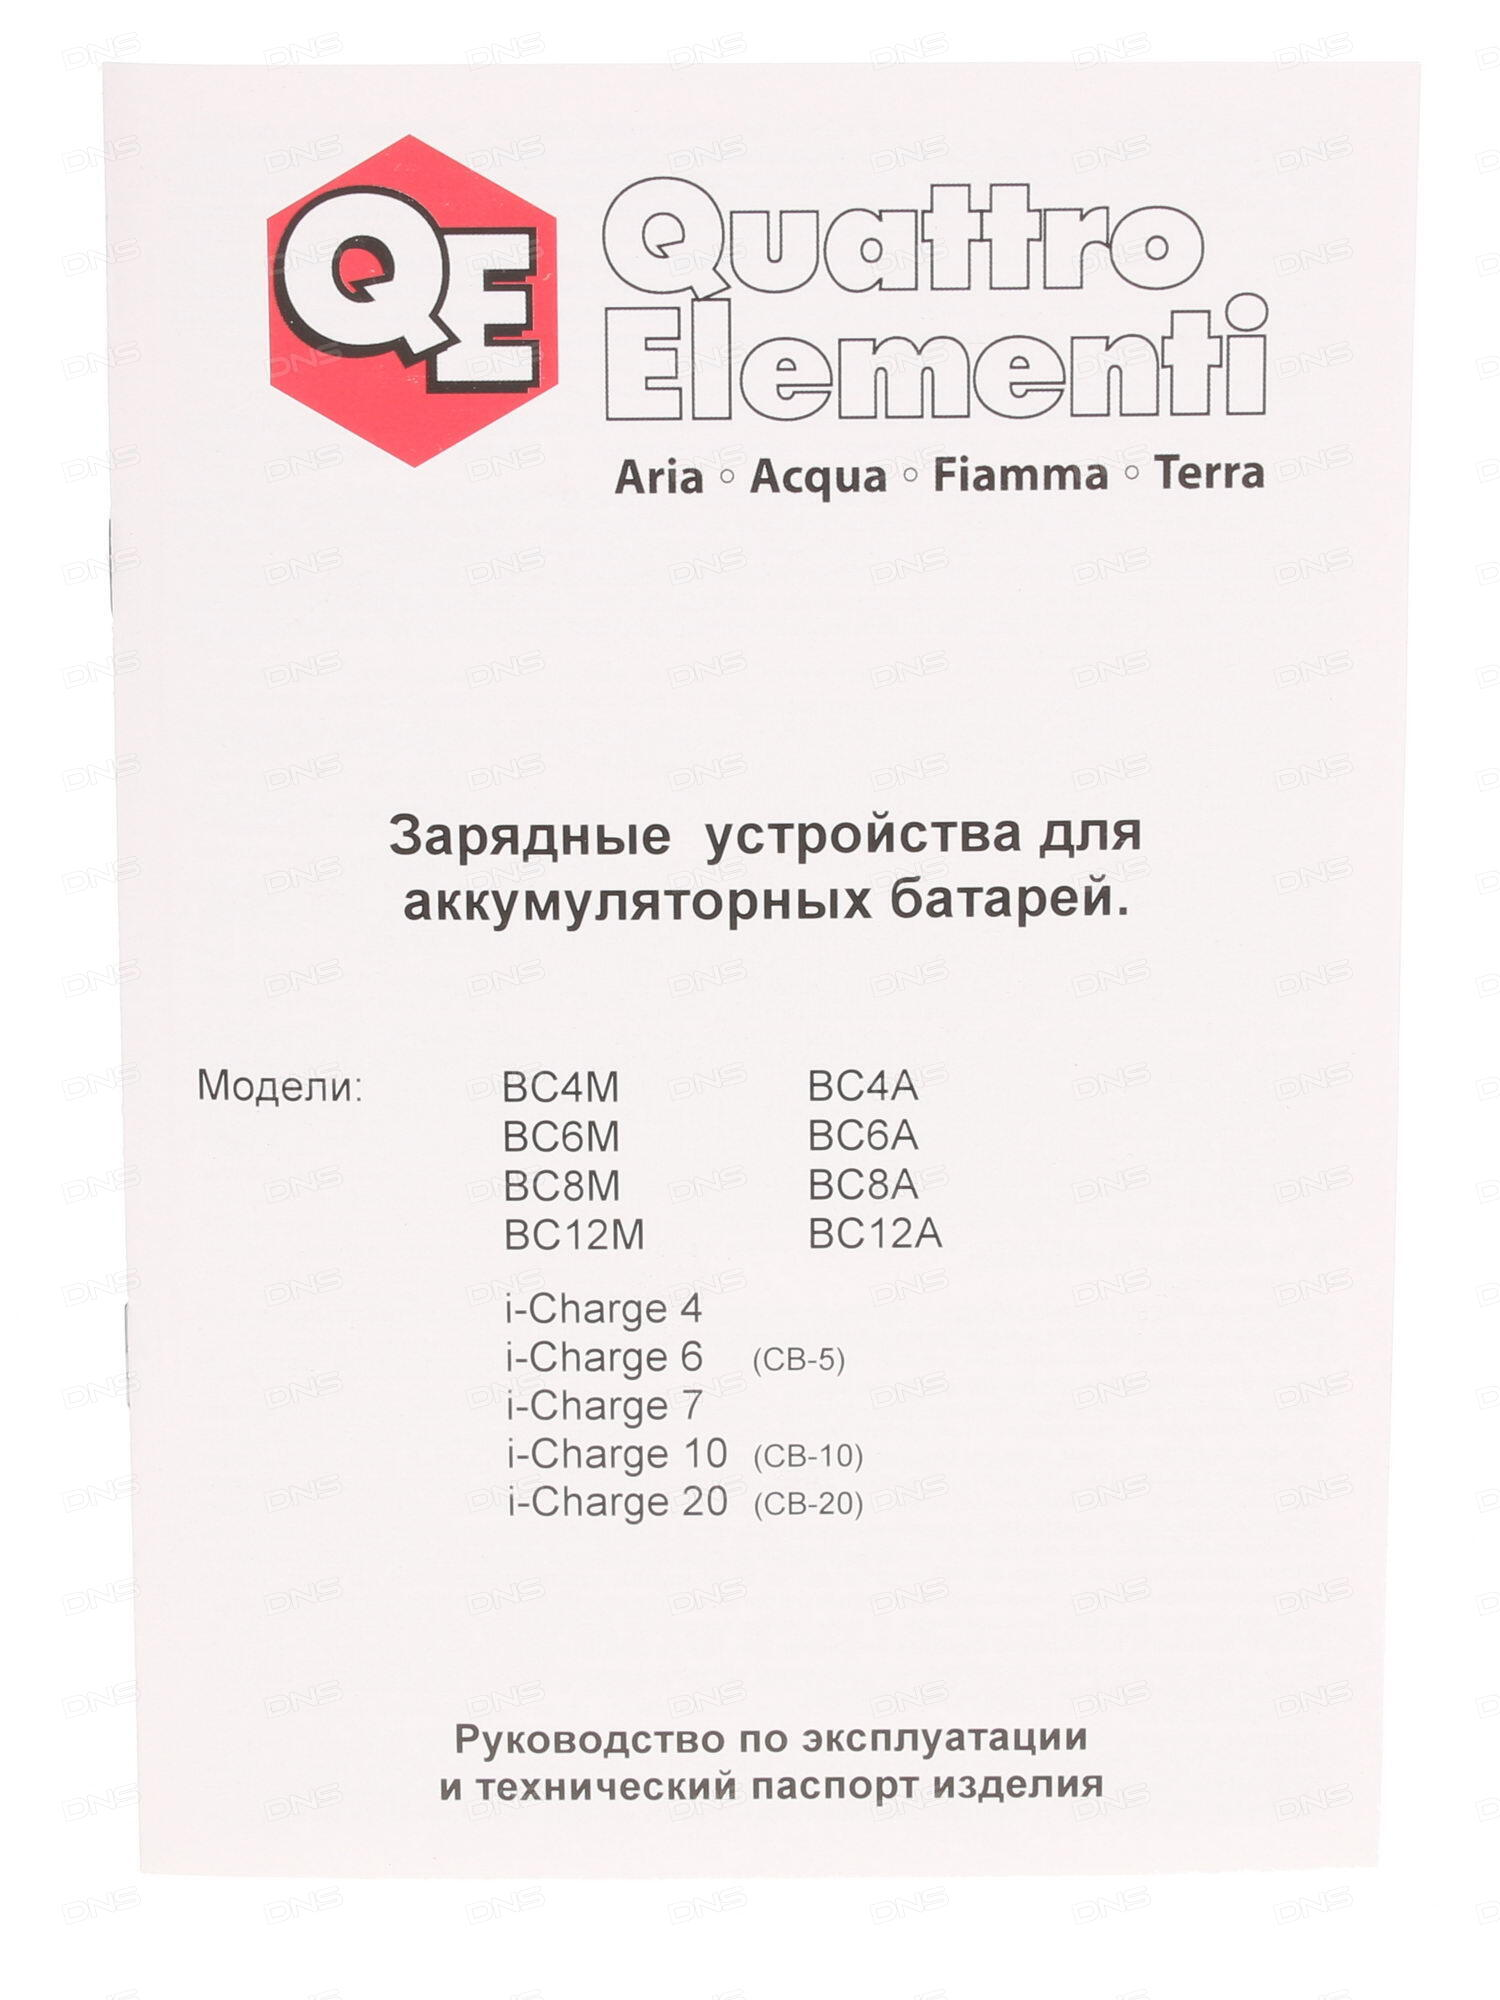 Устройство зарядное Quattro elementi 771-169i-charge20